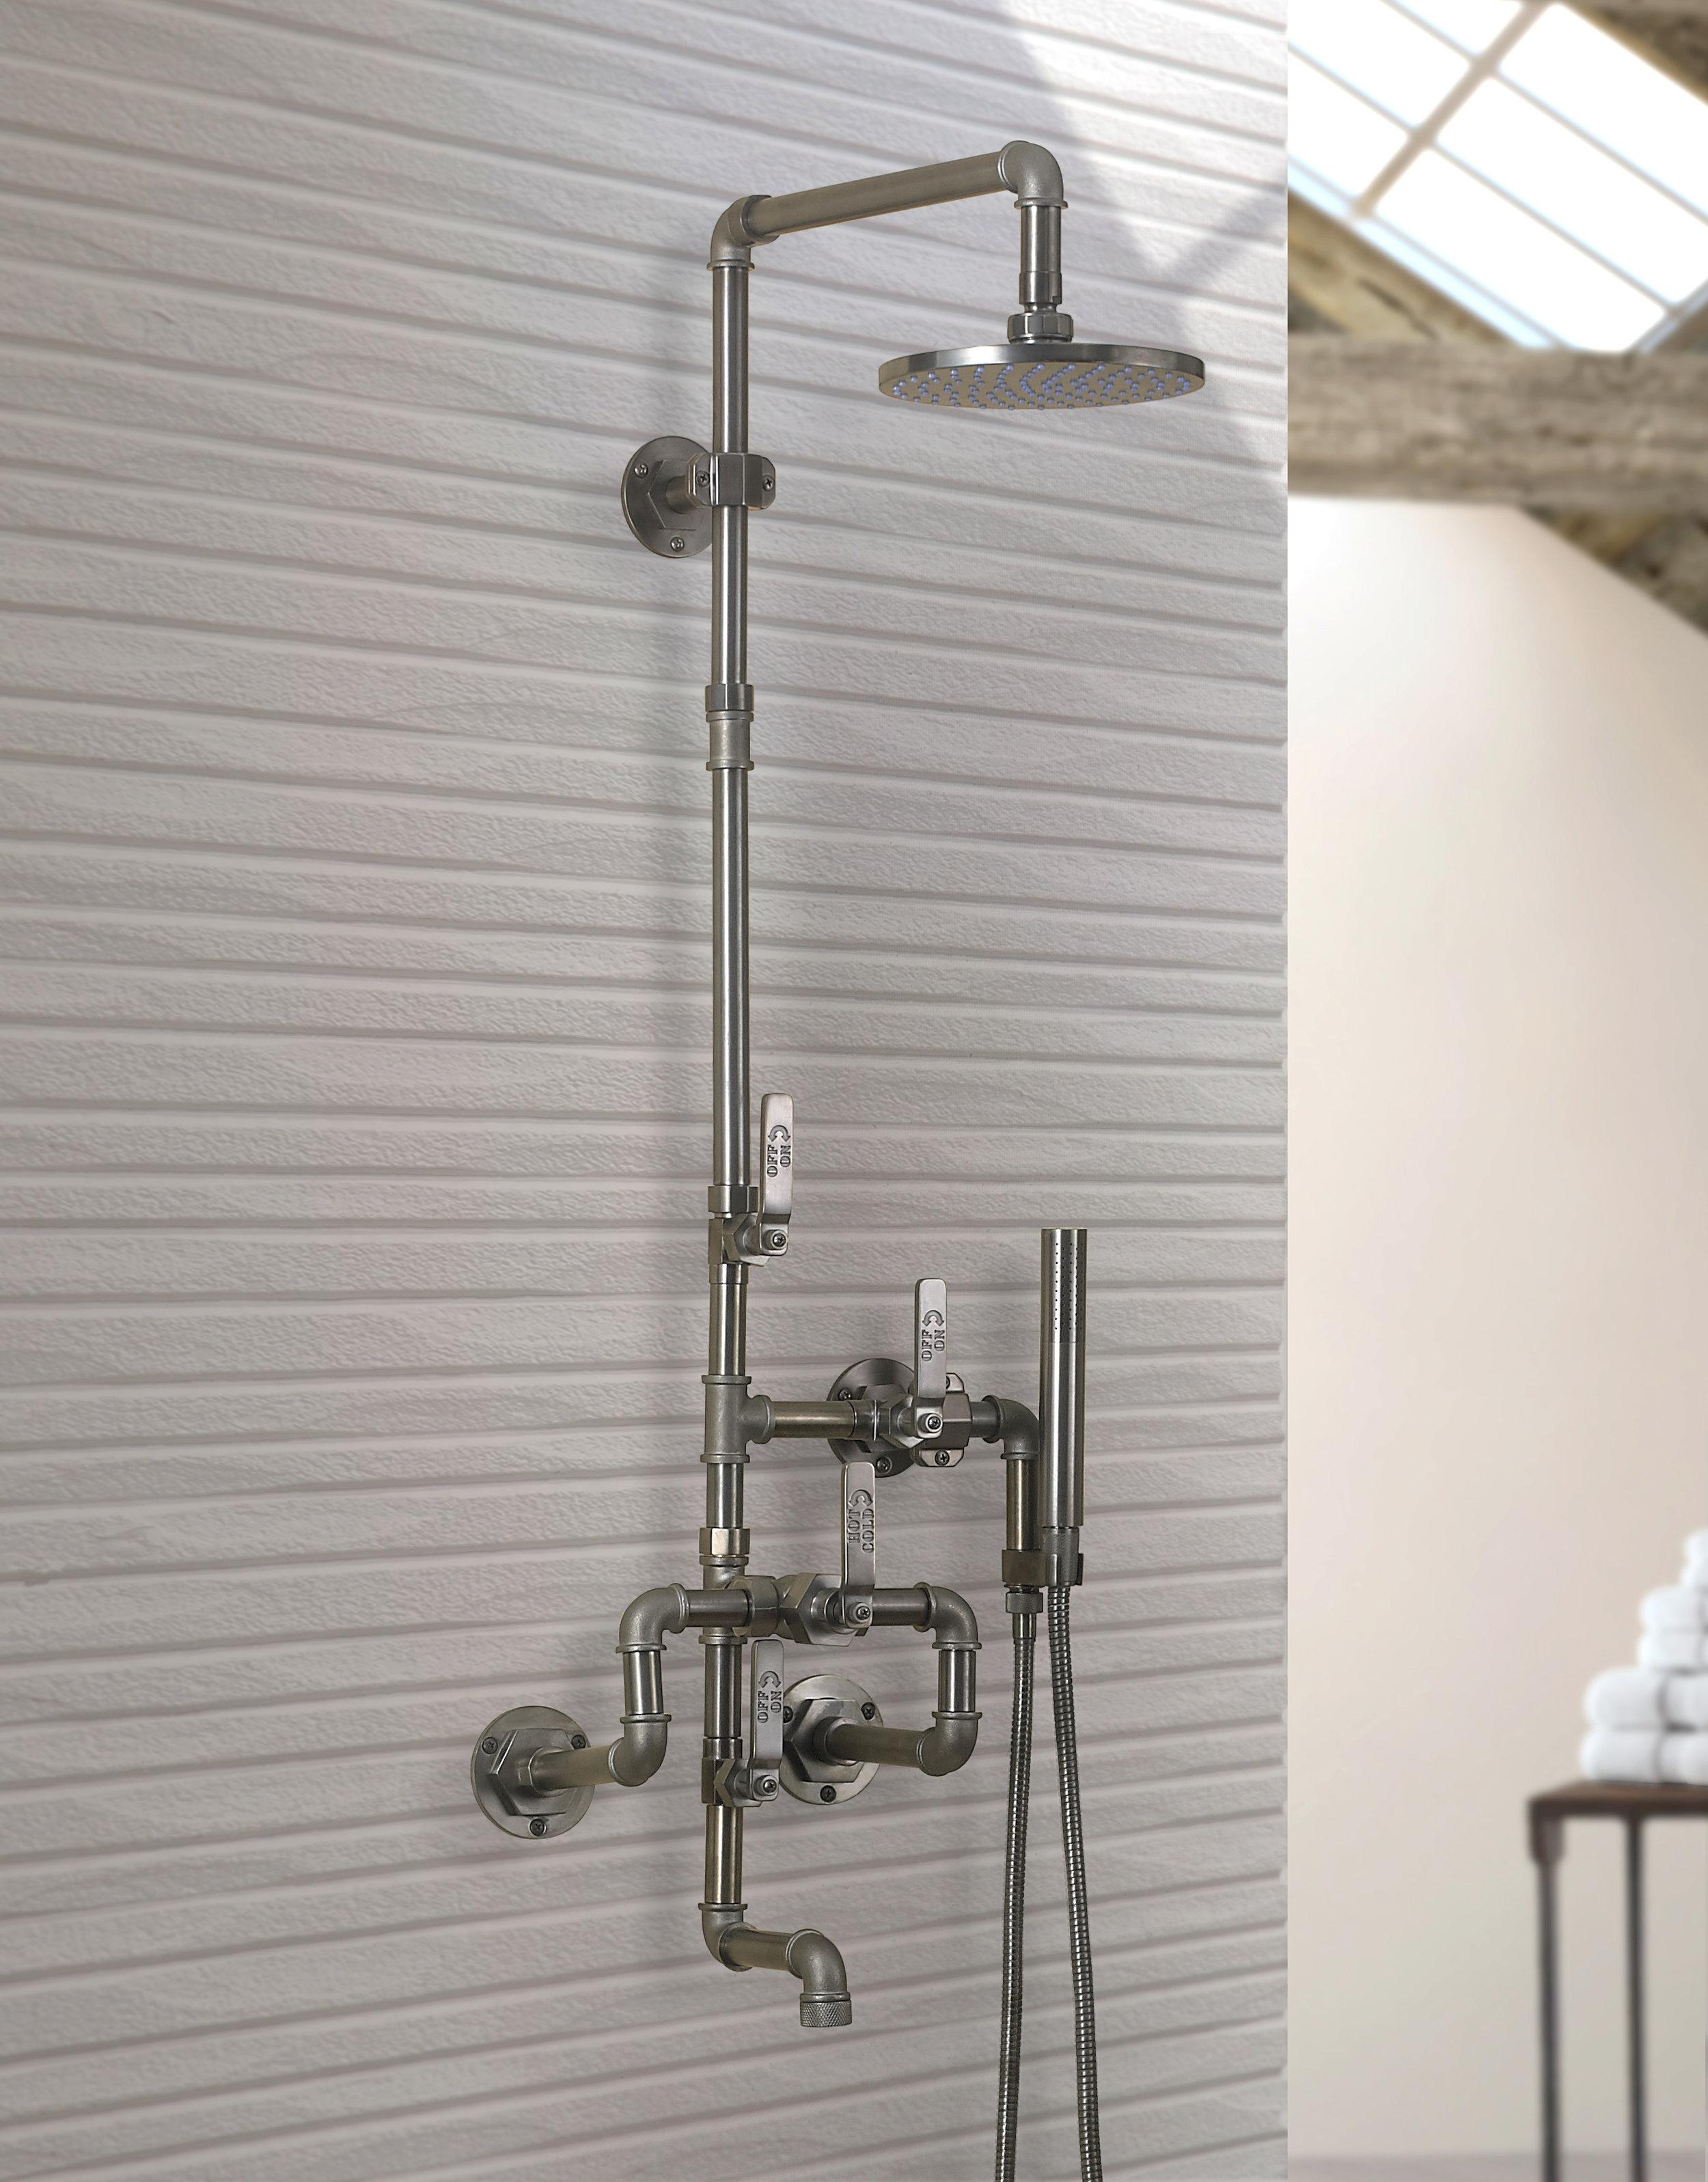 Elan-Vital-Thermostatic-Shower1.jpg